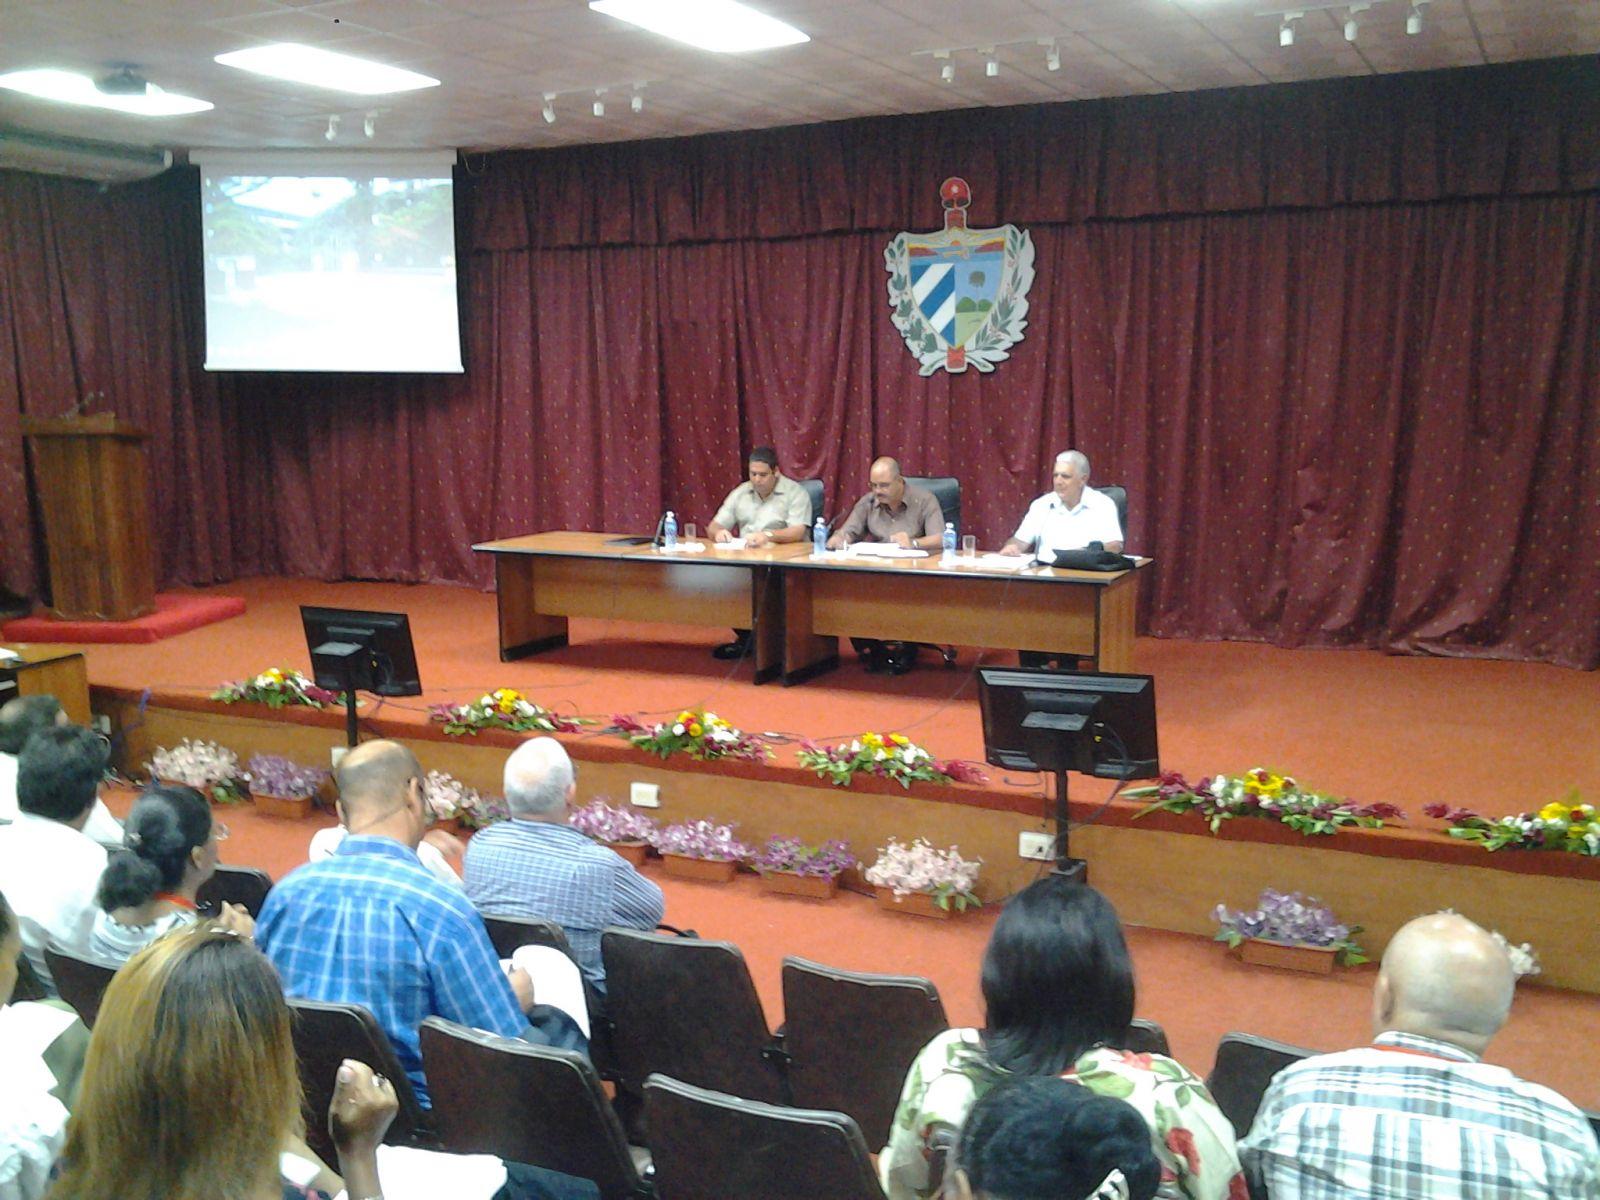 Asamblea Provincial de La Habana en sesión ordinaria. Fotos: Isel Quintana